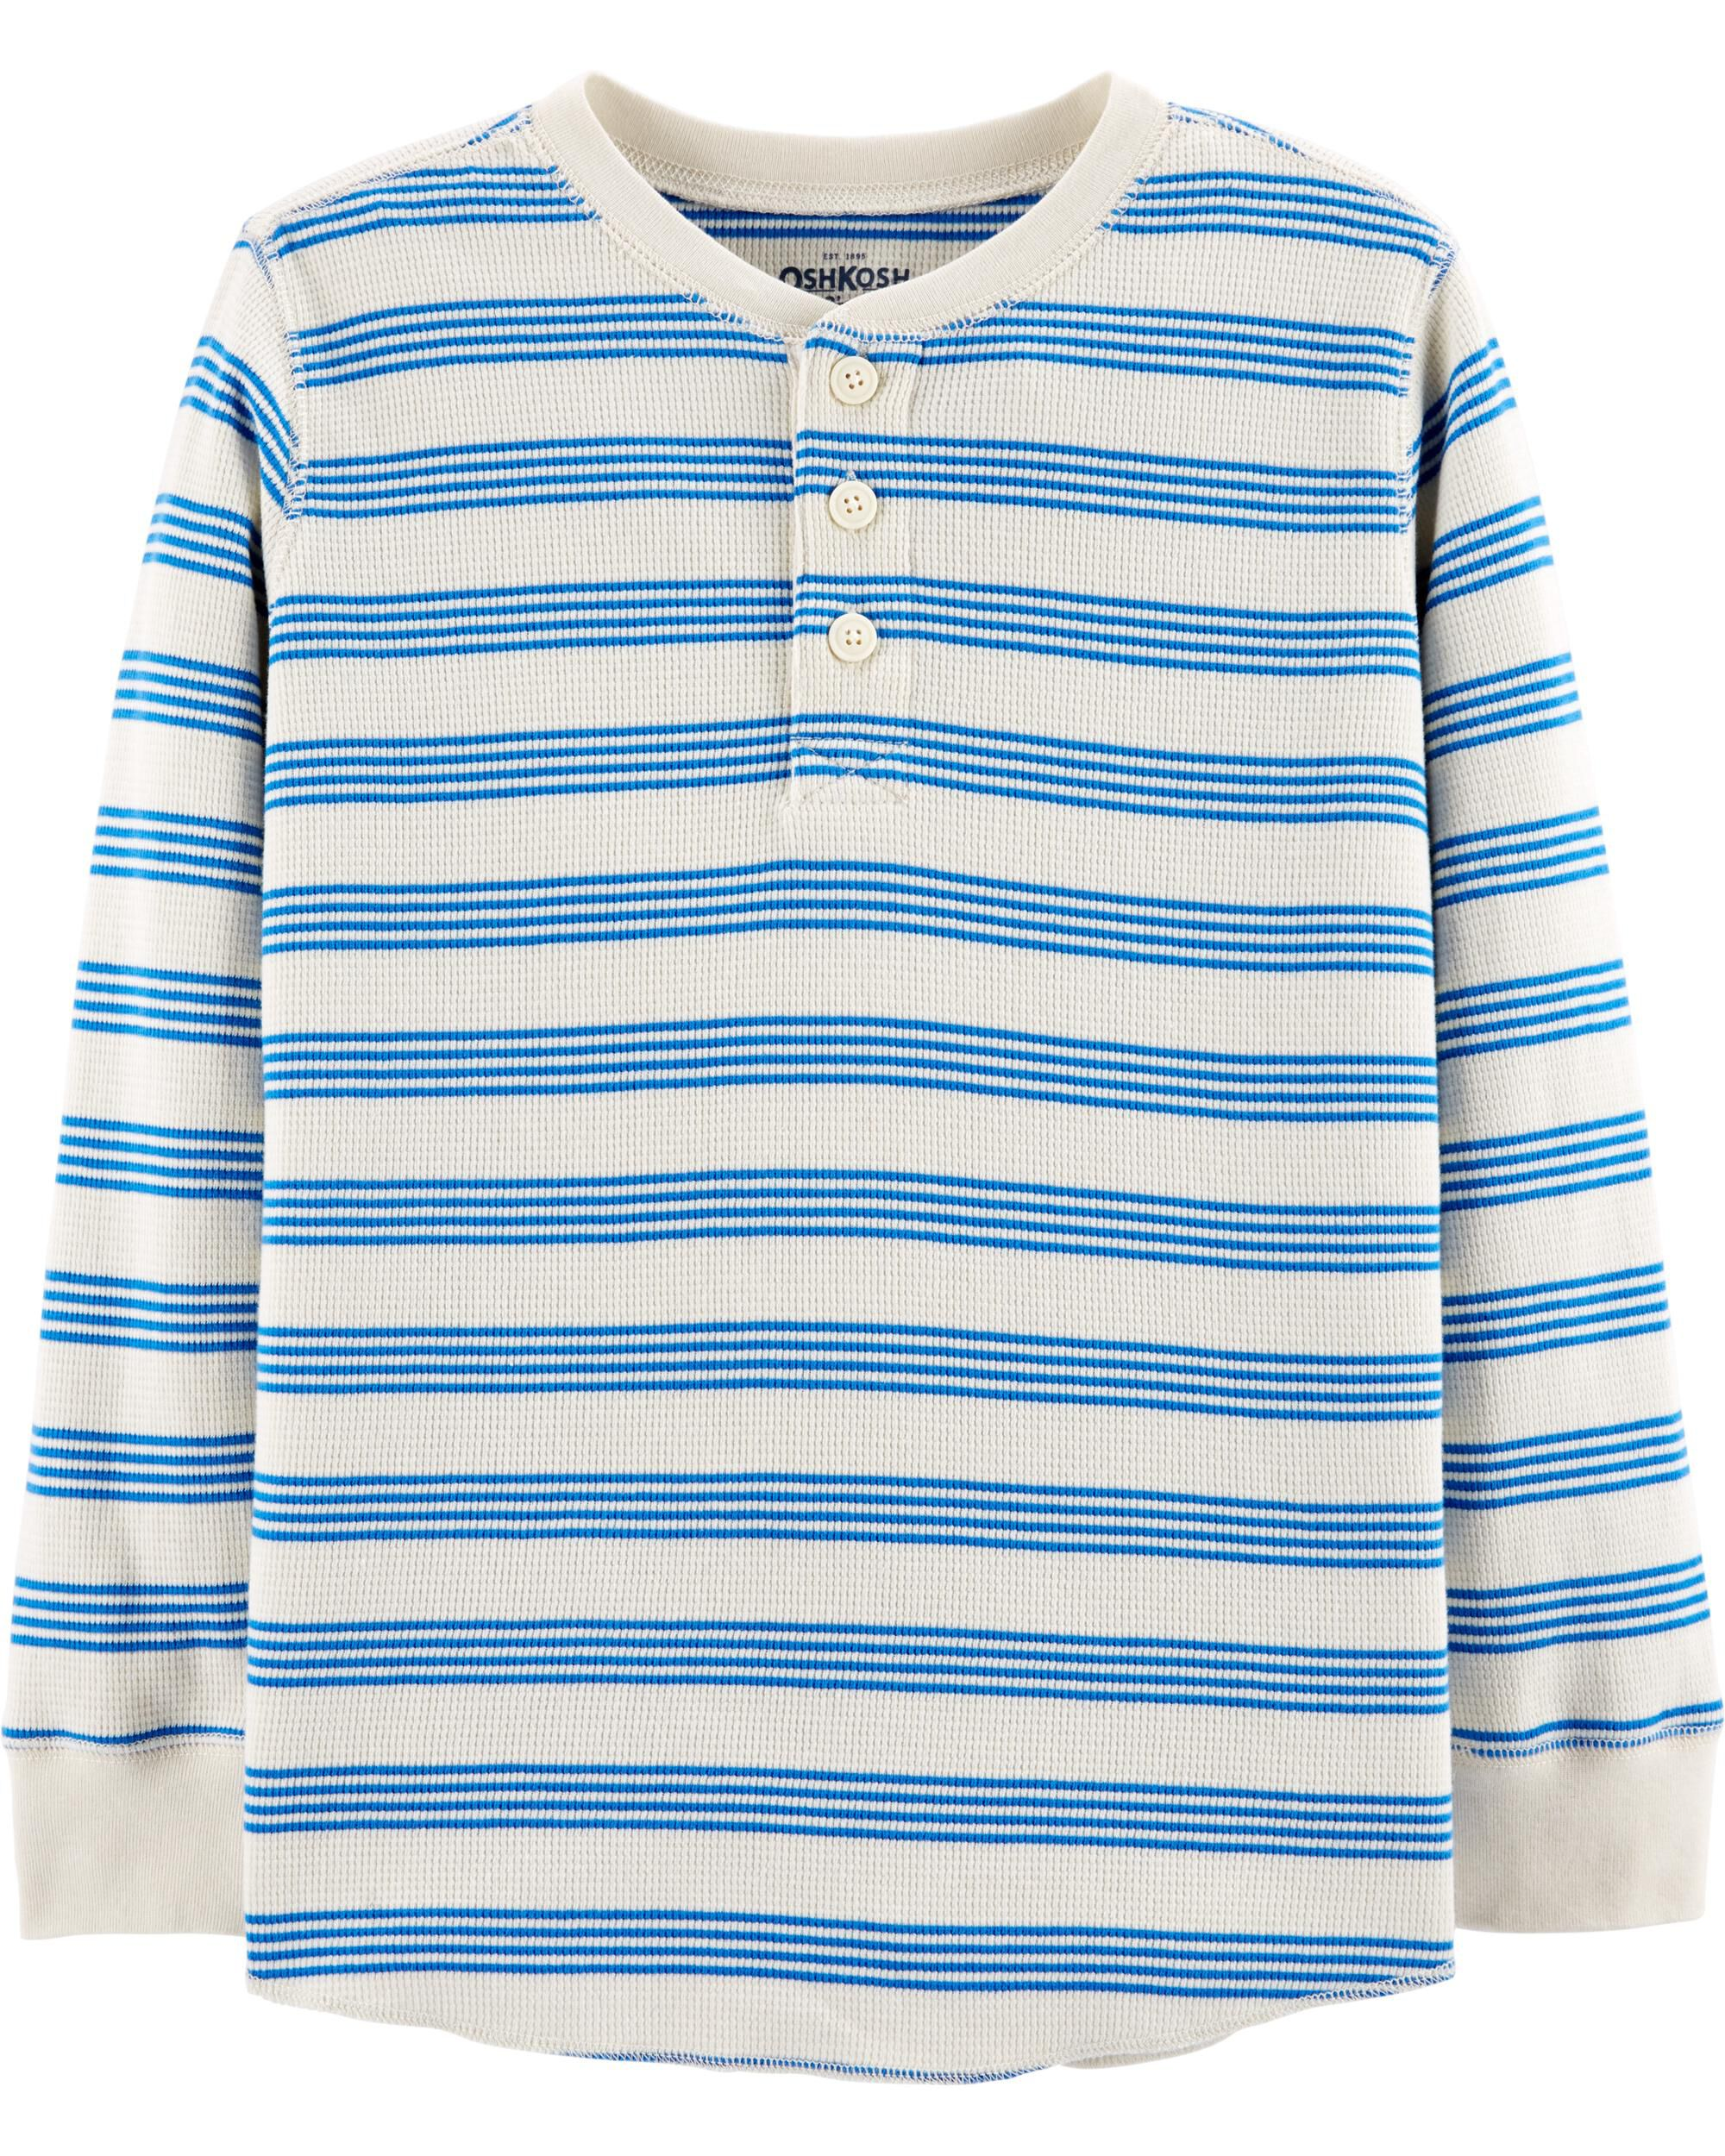 Light Blue OshKosh BGosh Boys Striped Thermal Long Sleeve Tee